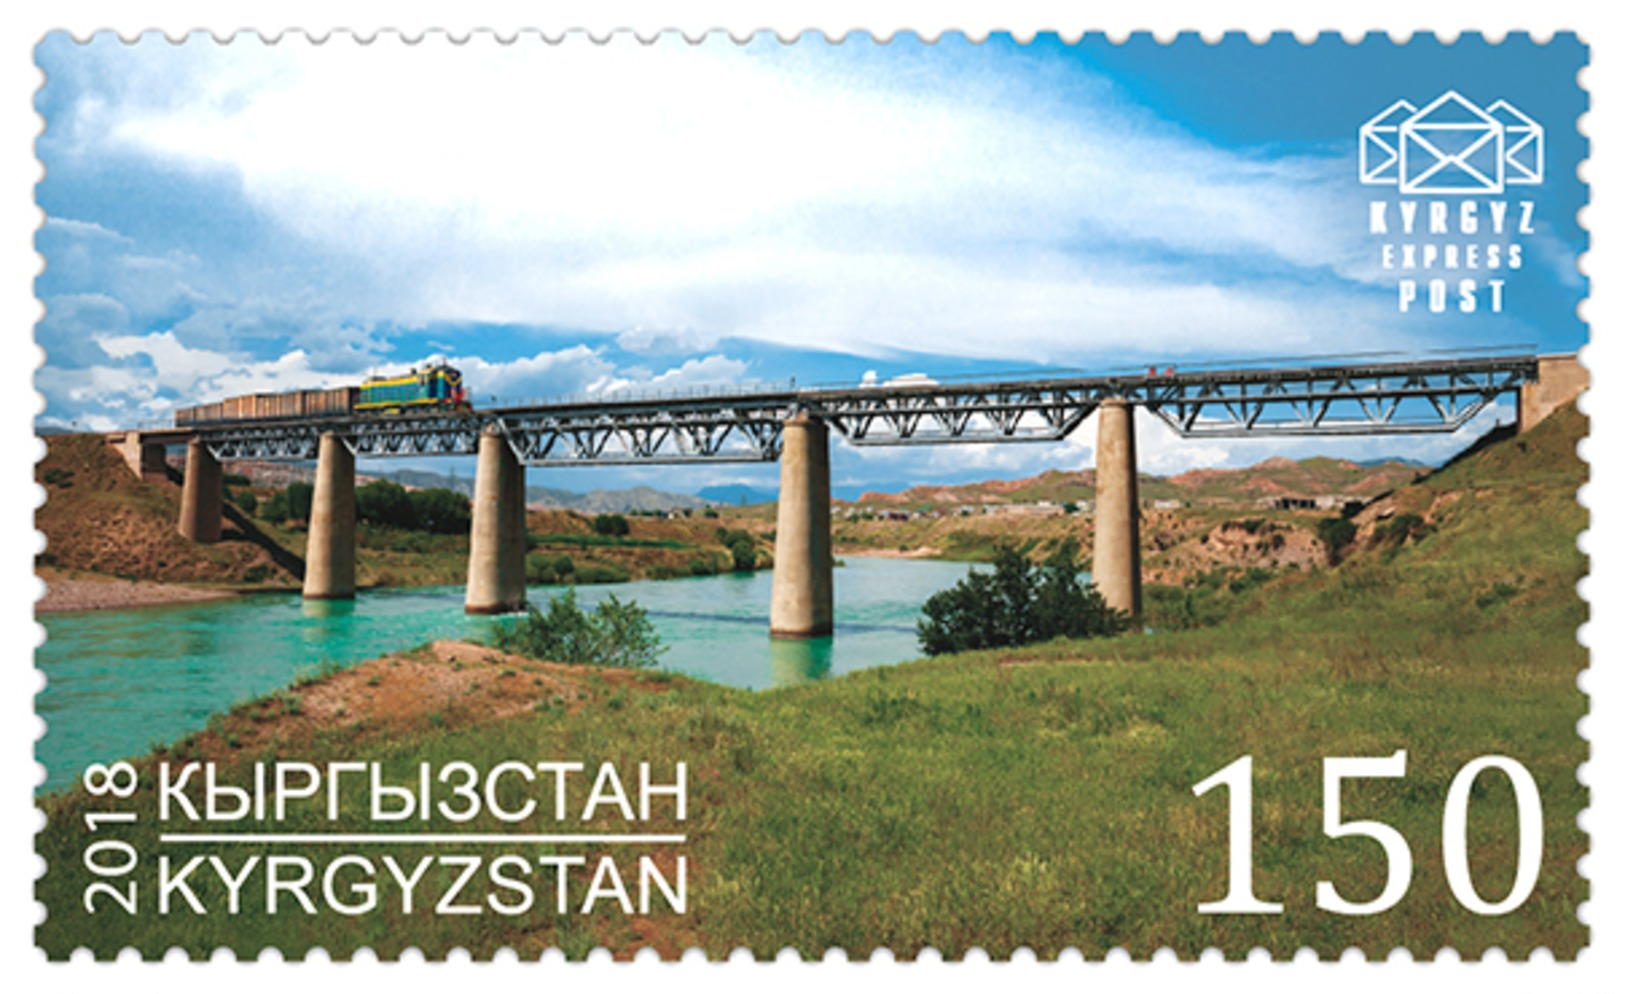 H01 Kyrgyzstan 2018 Mi# 98-99 Bridges Trains Cars MNH - Kirghizistan